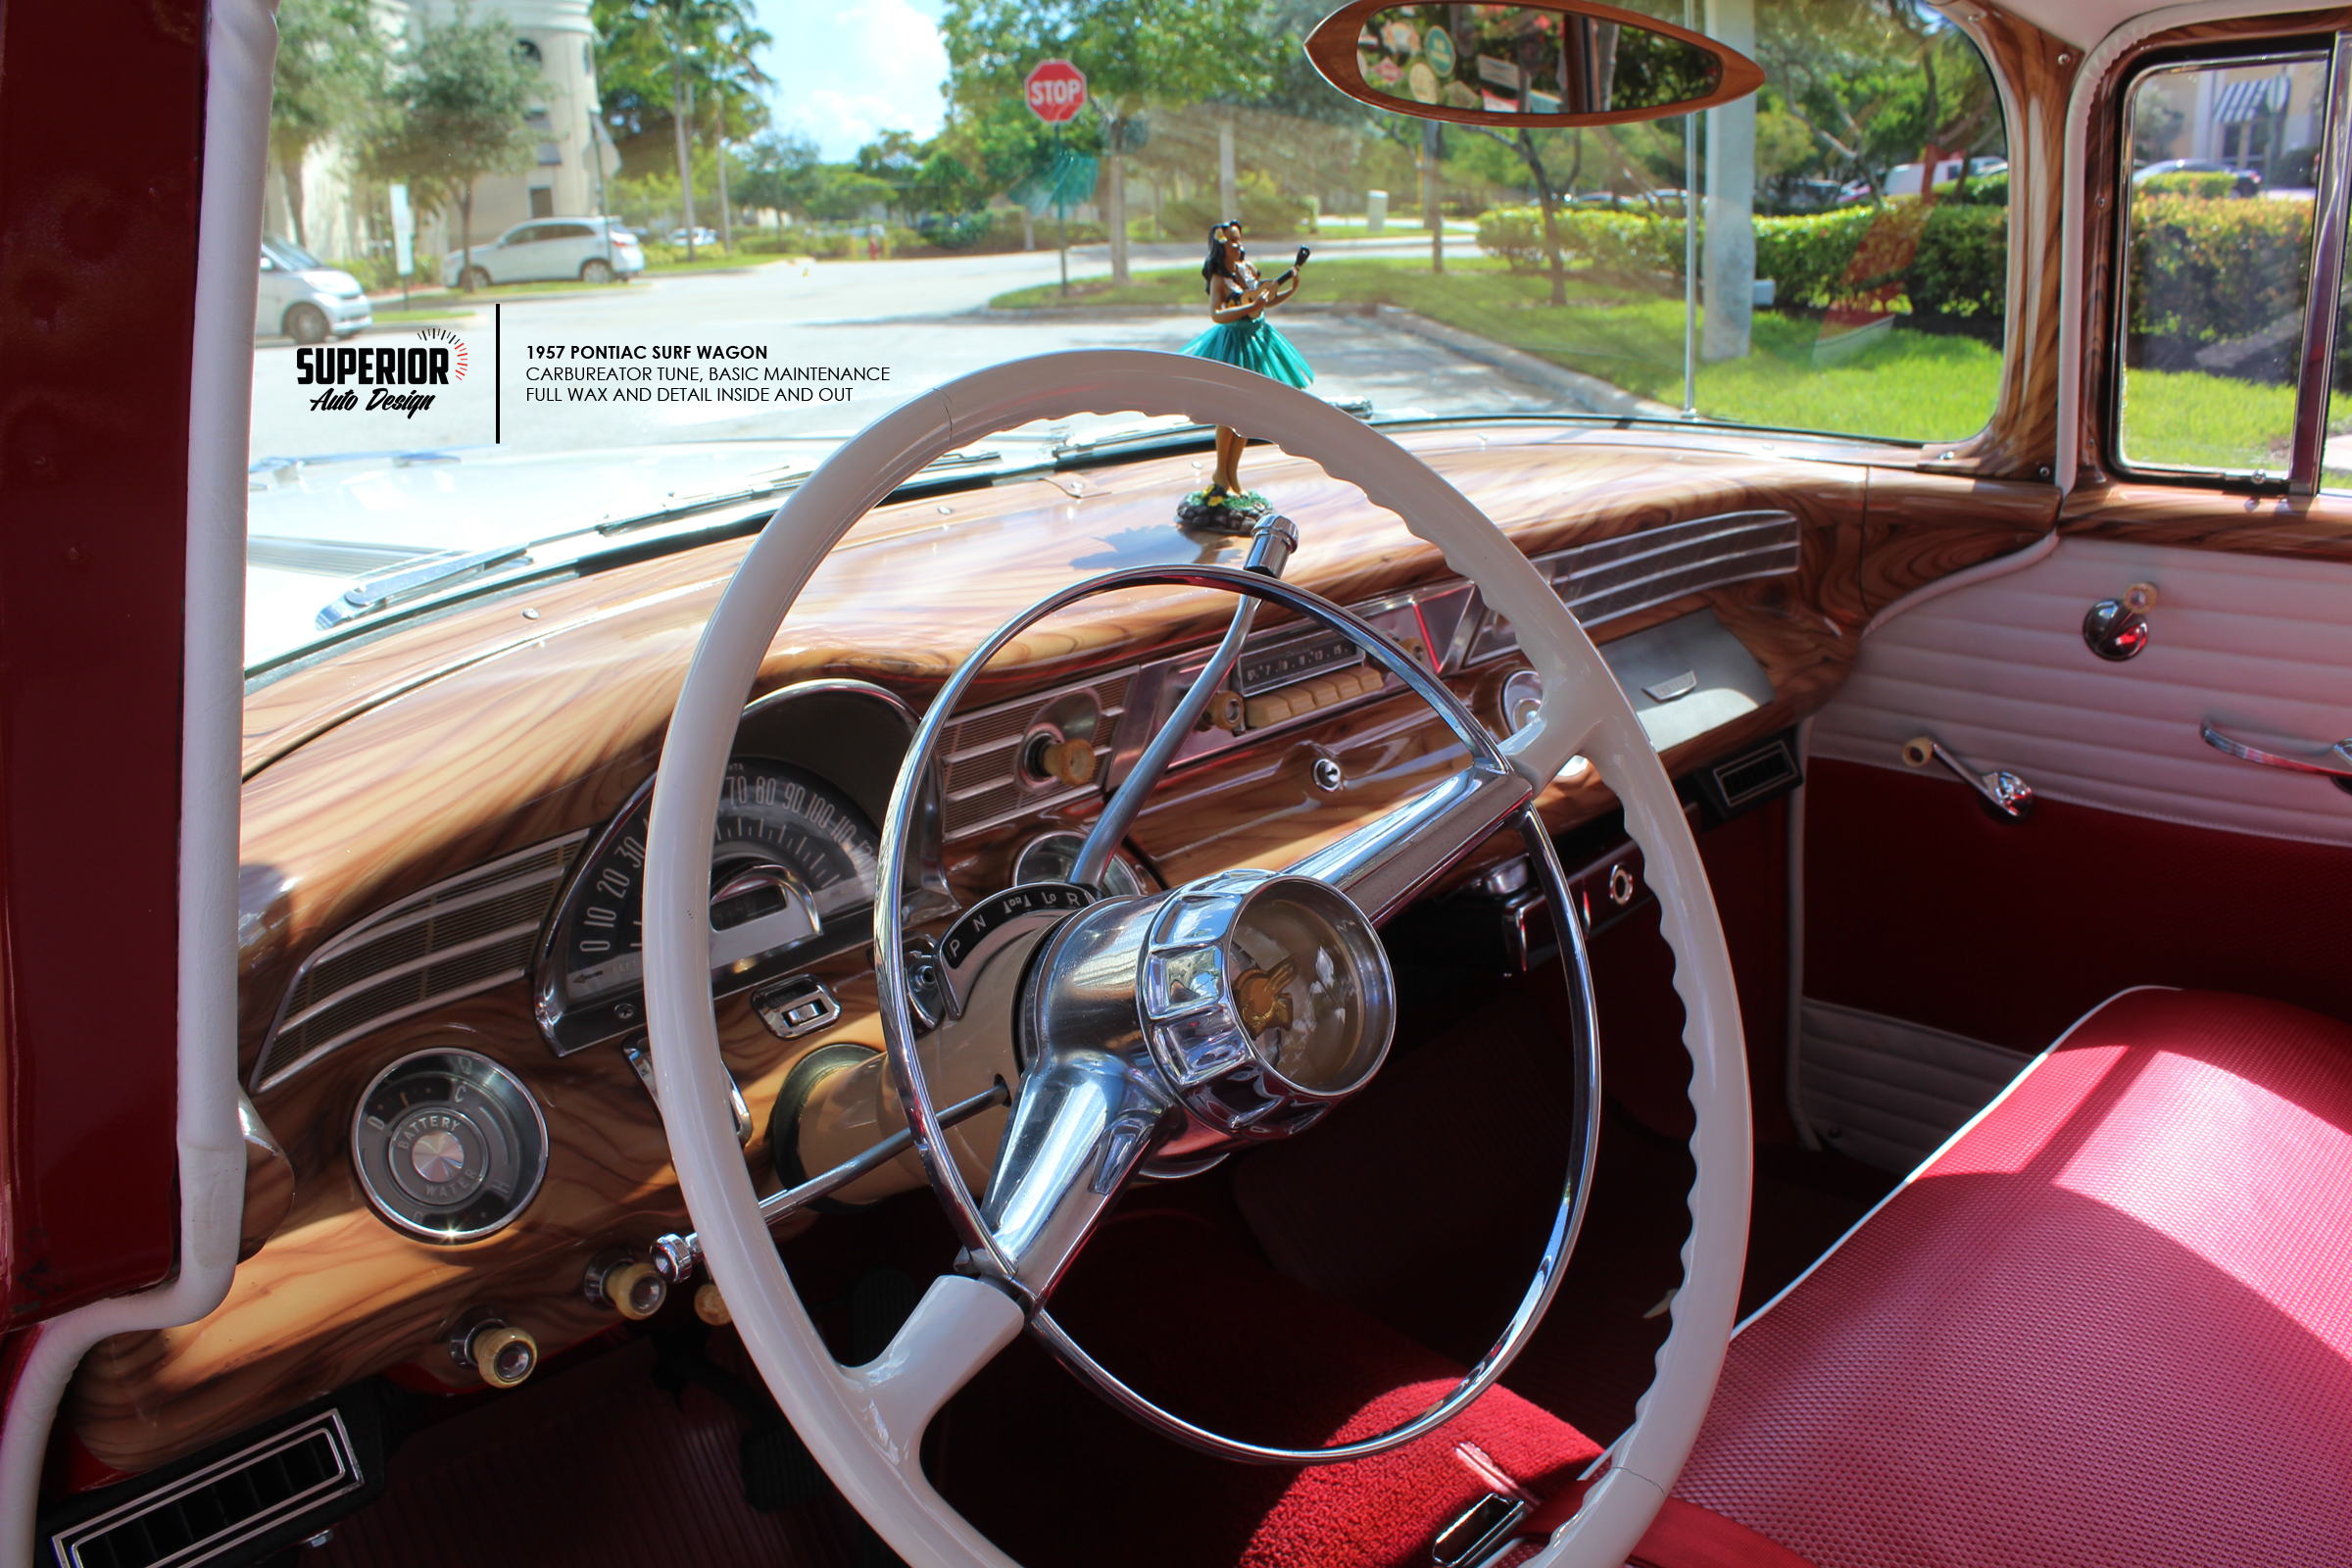 1956-pontiac-surf-wagon-kenny-chesney-superior-auto-design-5